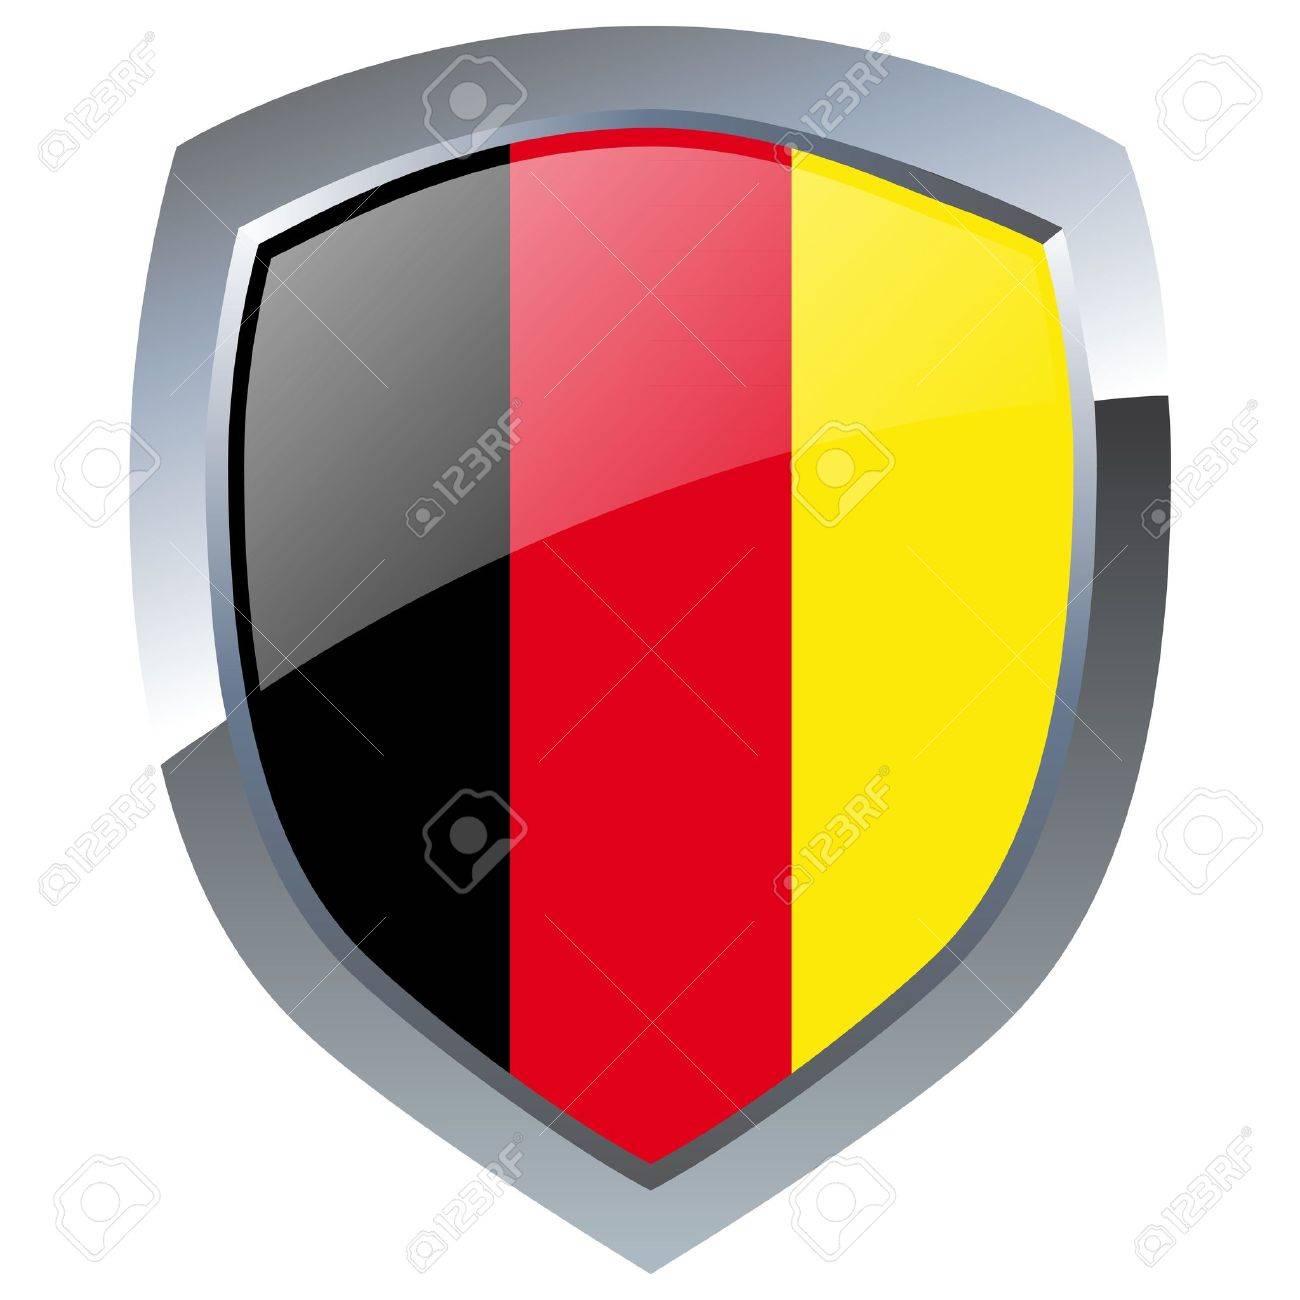 Germany Emblem Stock Vector - 9407202